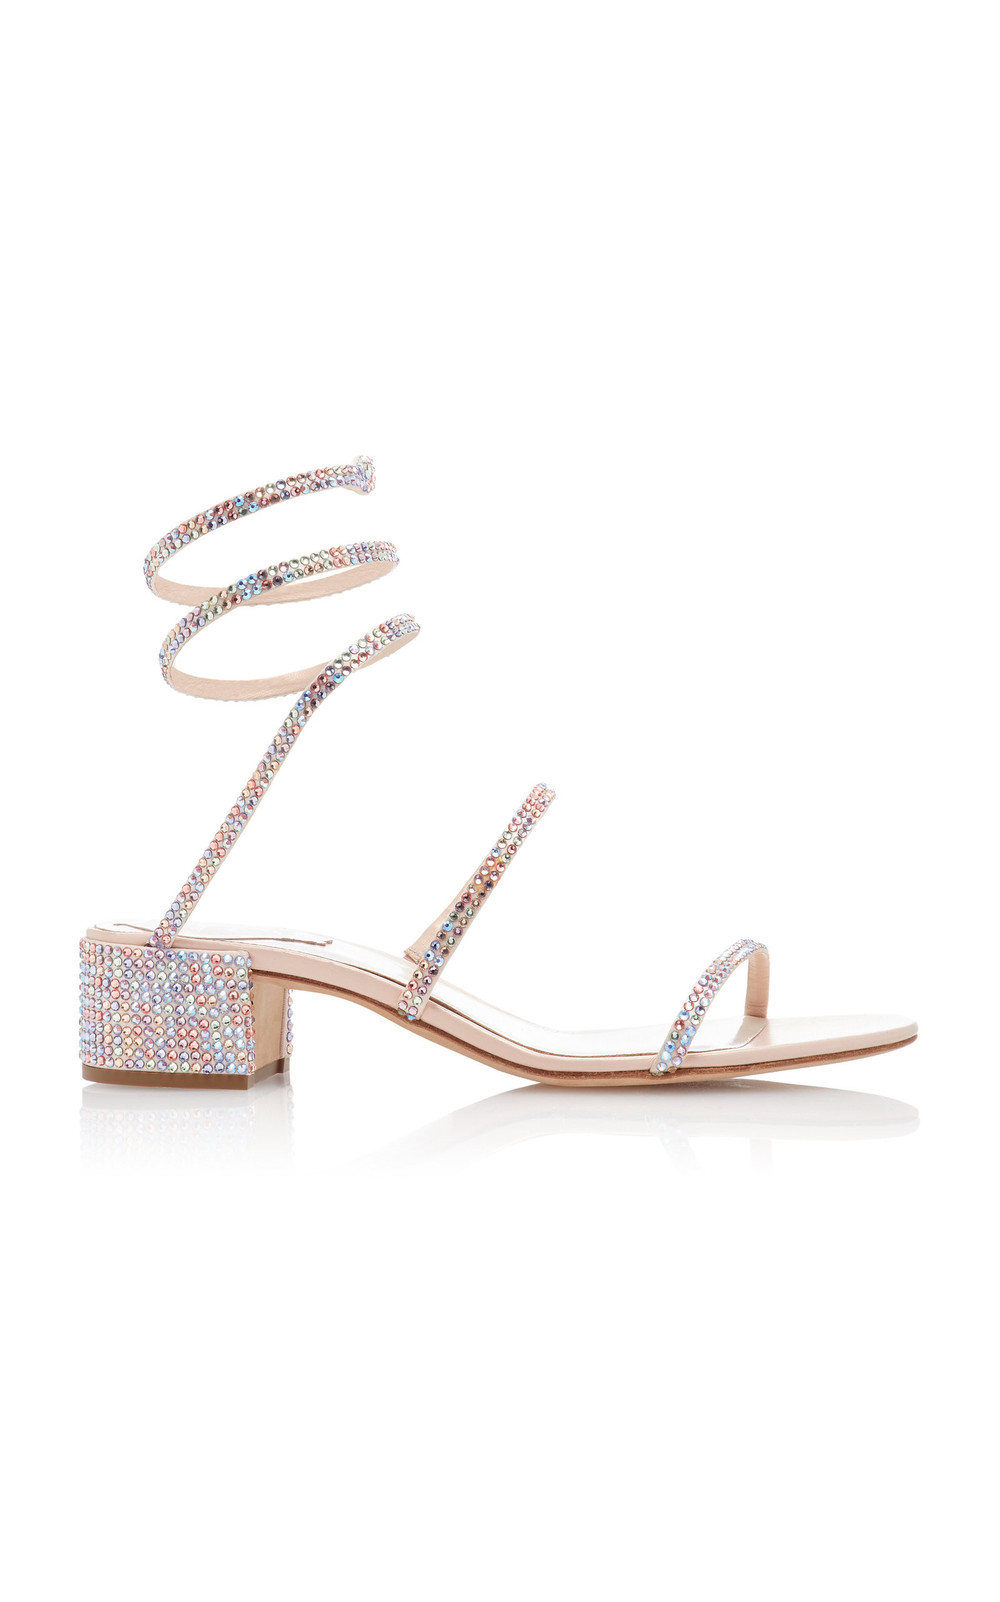 Rene Caovilla Crystal-Embellished Satin Sandals in multi